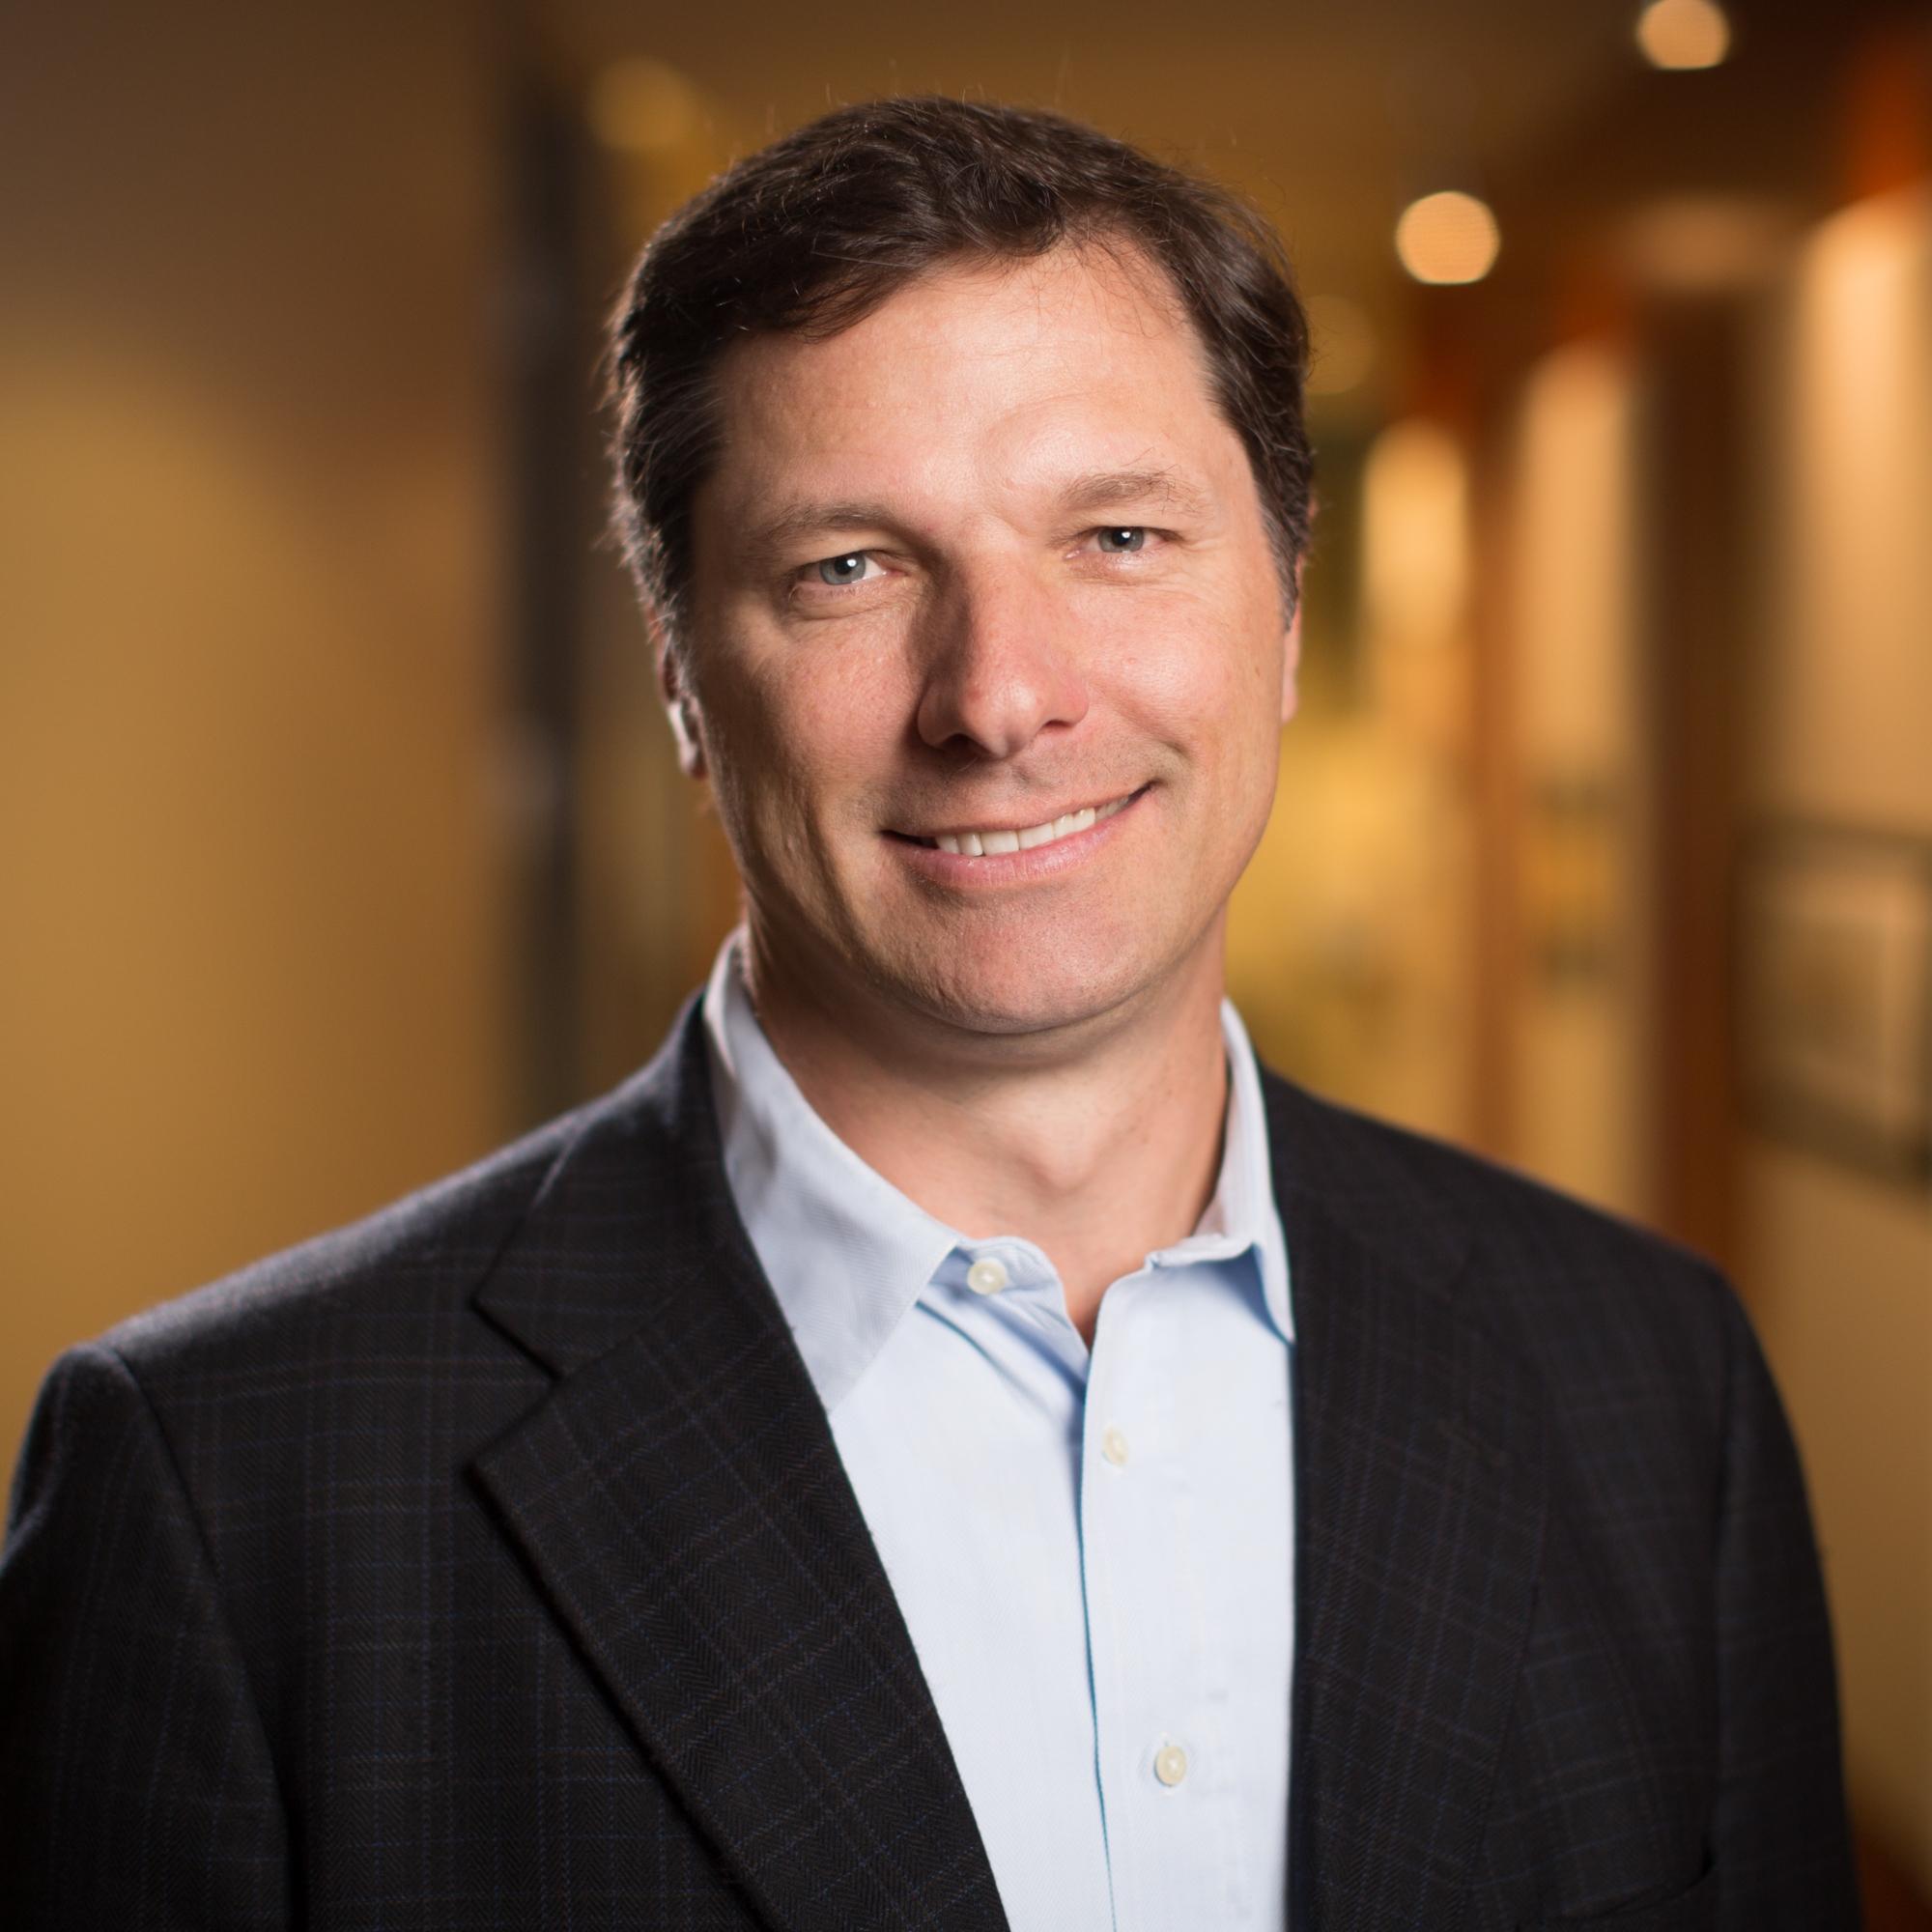 Steve Hogan, CEO Florida Citrus Sports